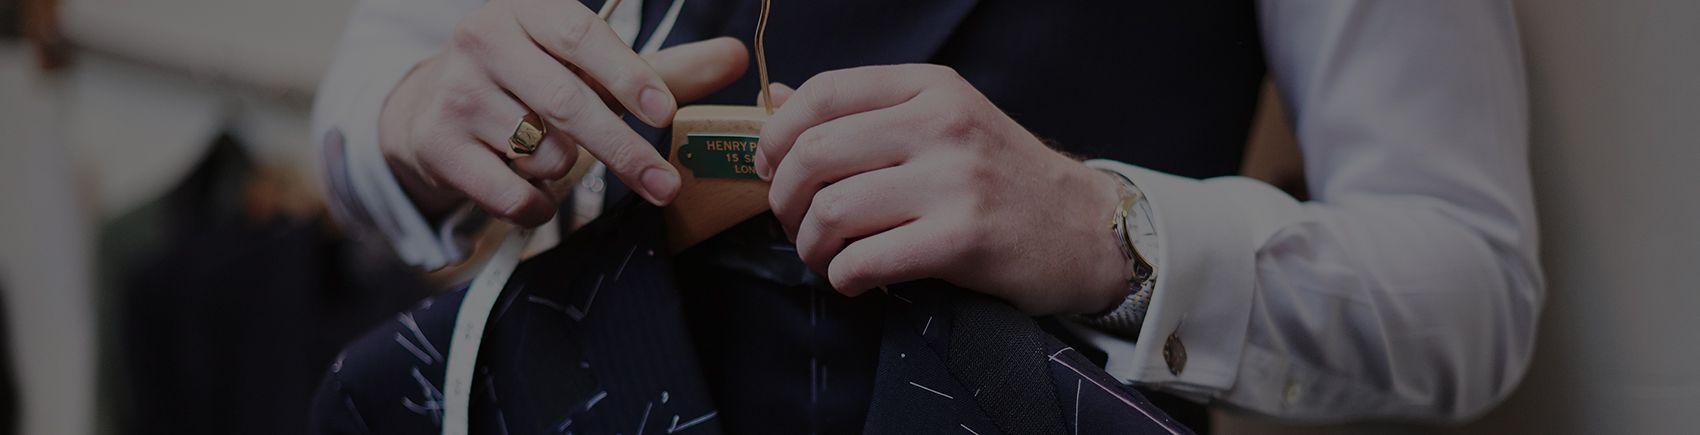 Henry Poole Tailors Savile Row Bespoke Tailoring Image 1